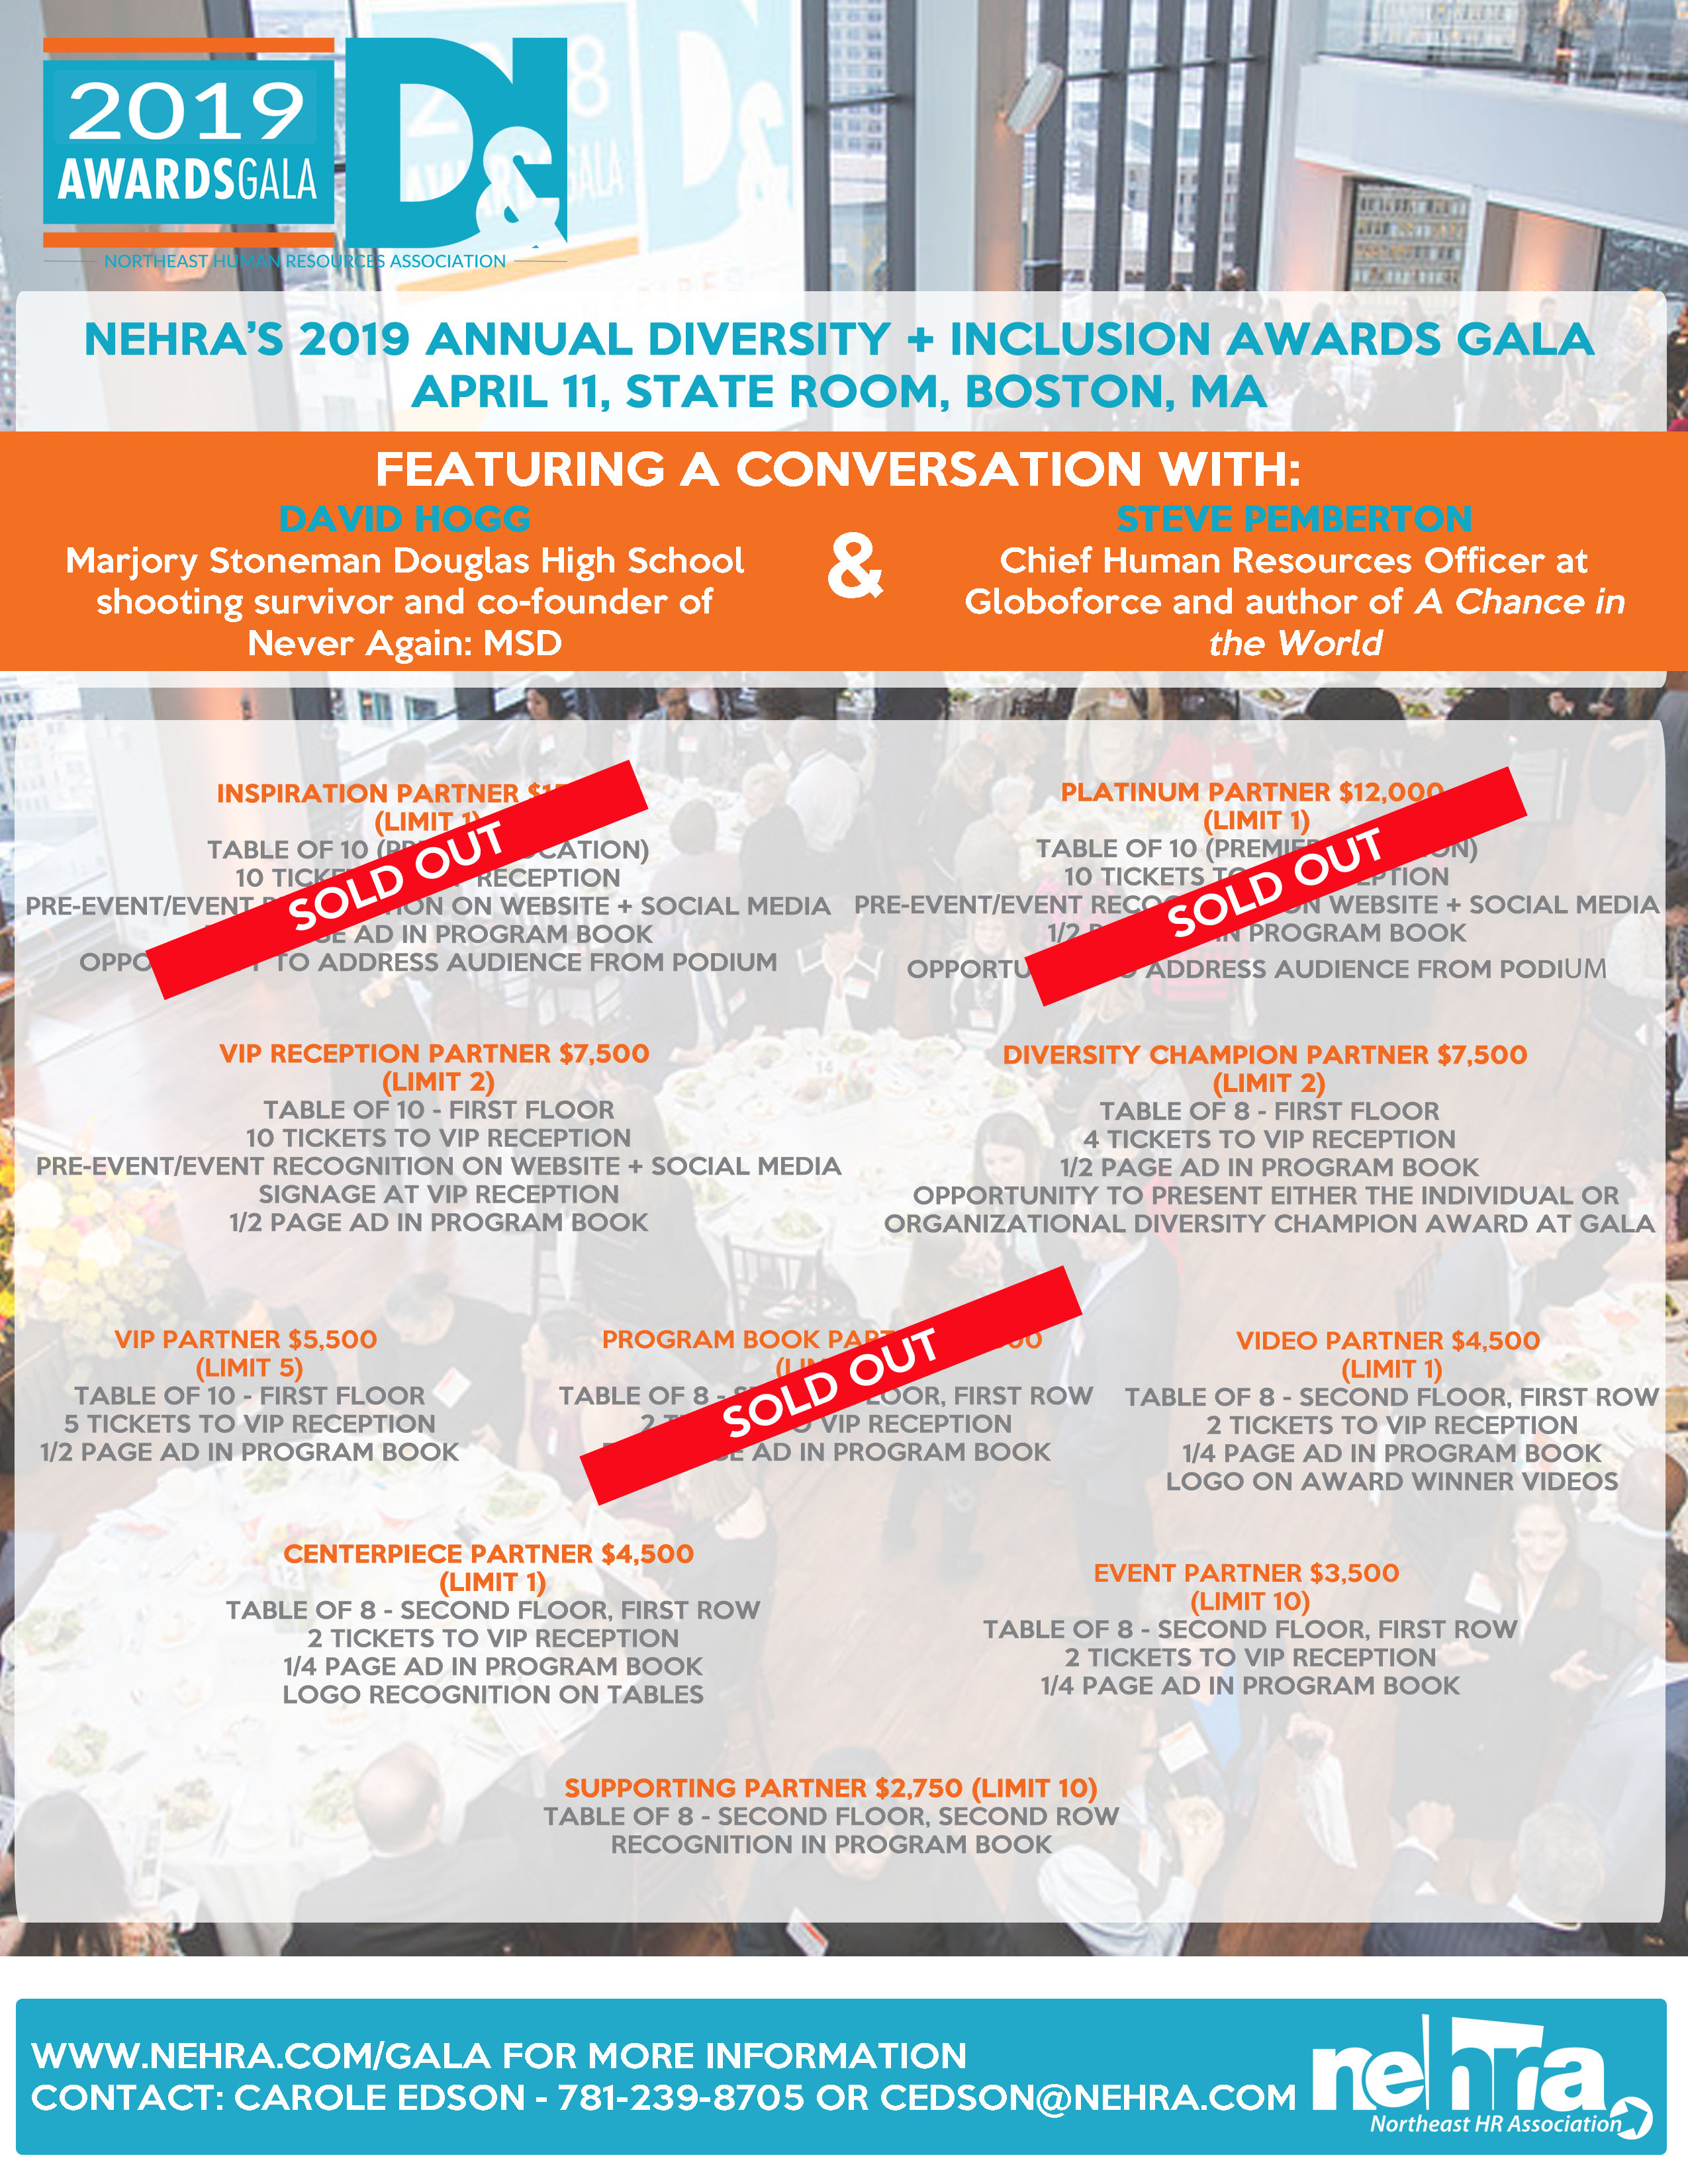 NEHRA's 2019 D&I Gala Sponsorship Flyer